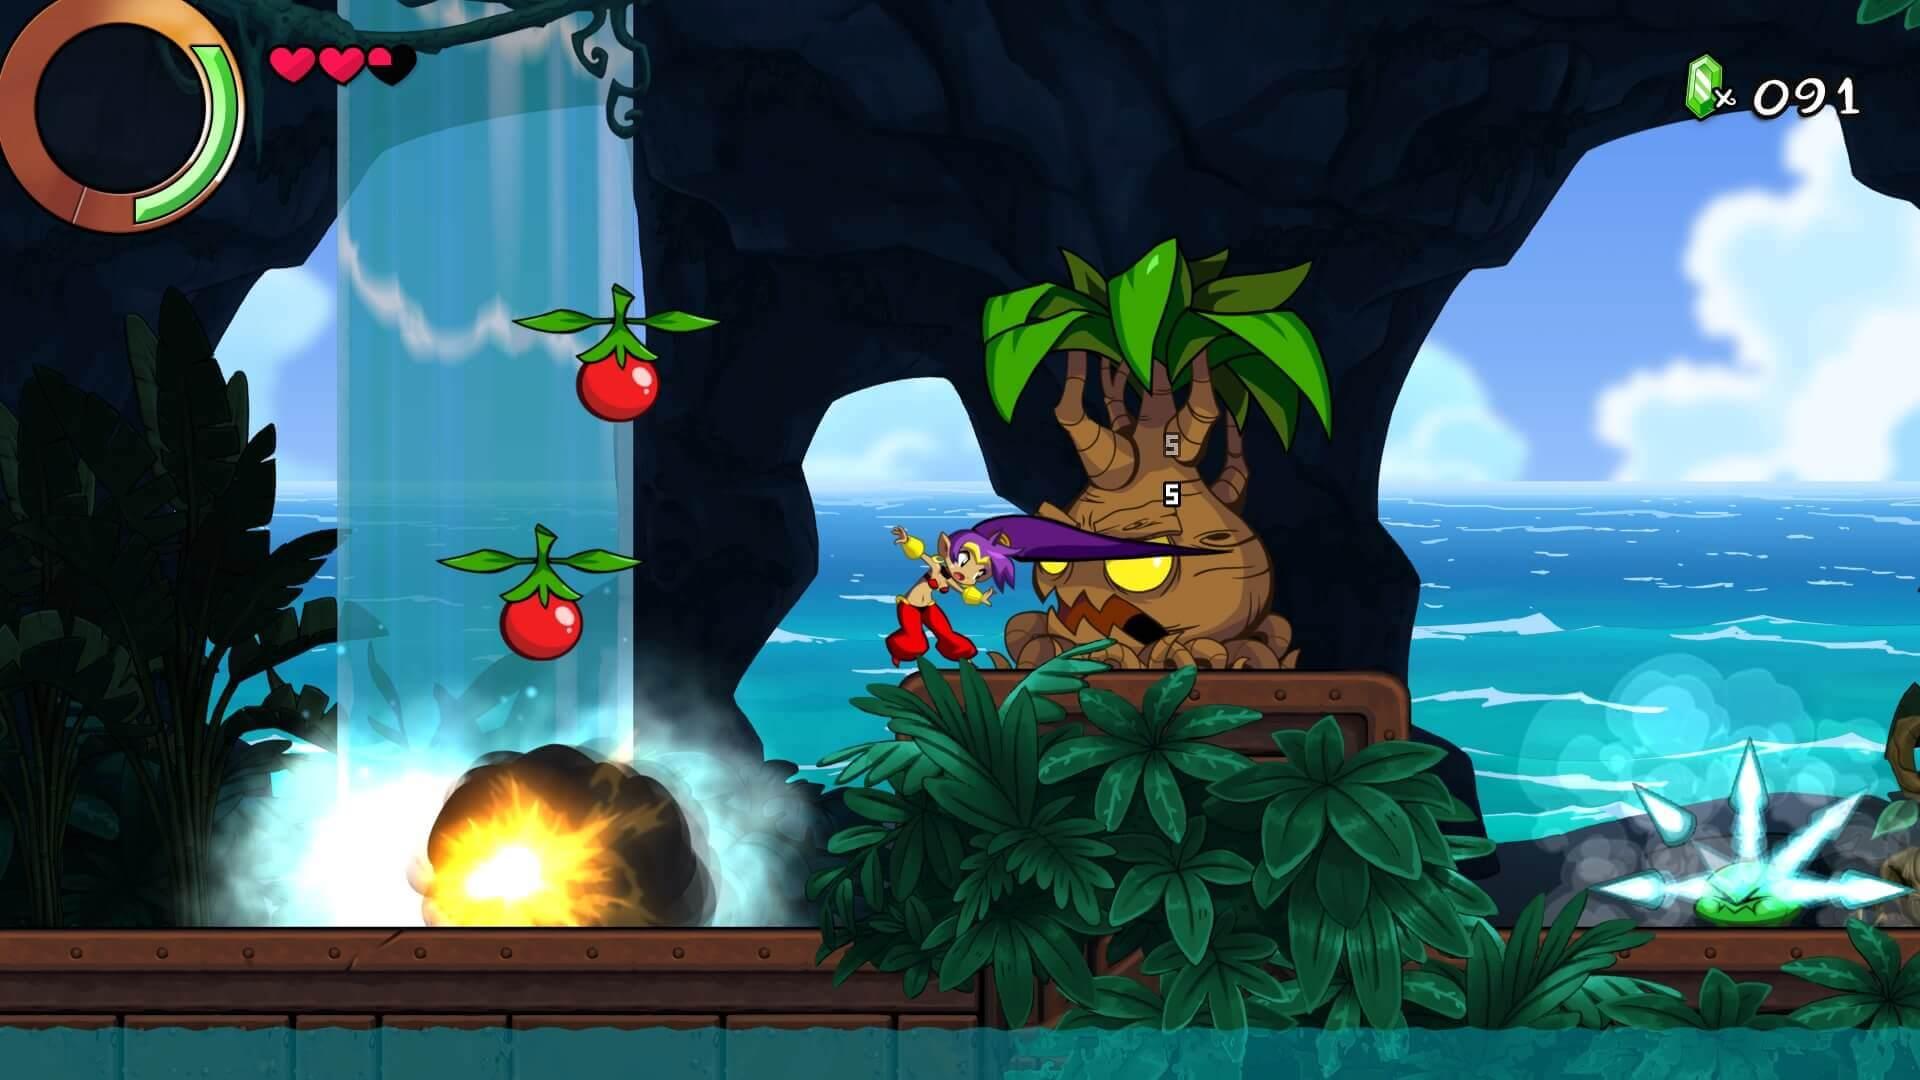 Análise Shantae and the Seven Sirens, Shantae, Shantae and the Seven Sirens, WayForward, Delfos